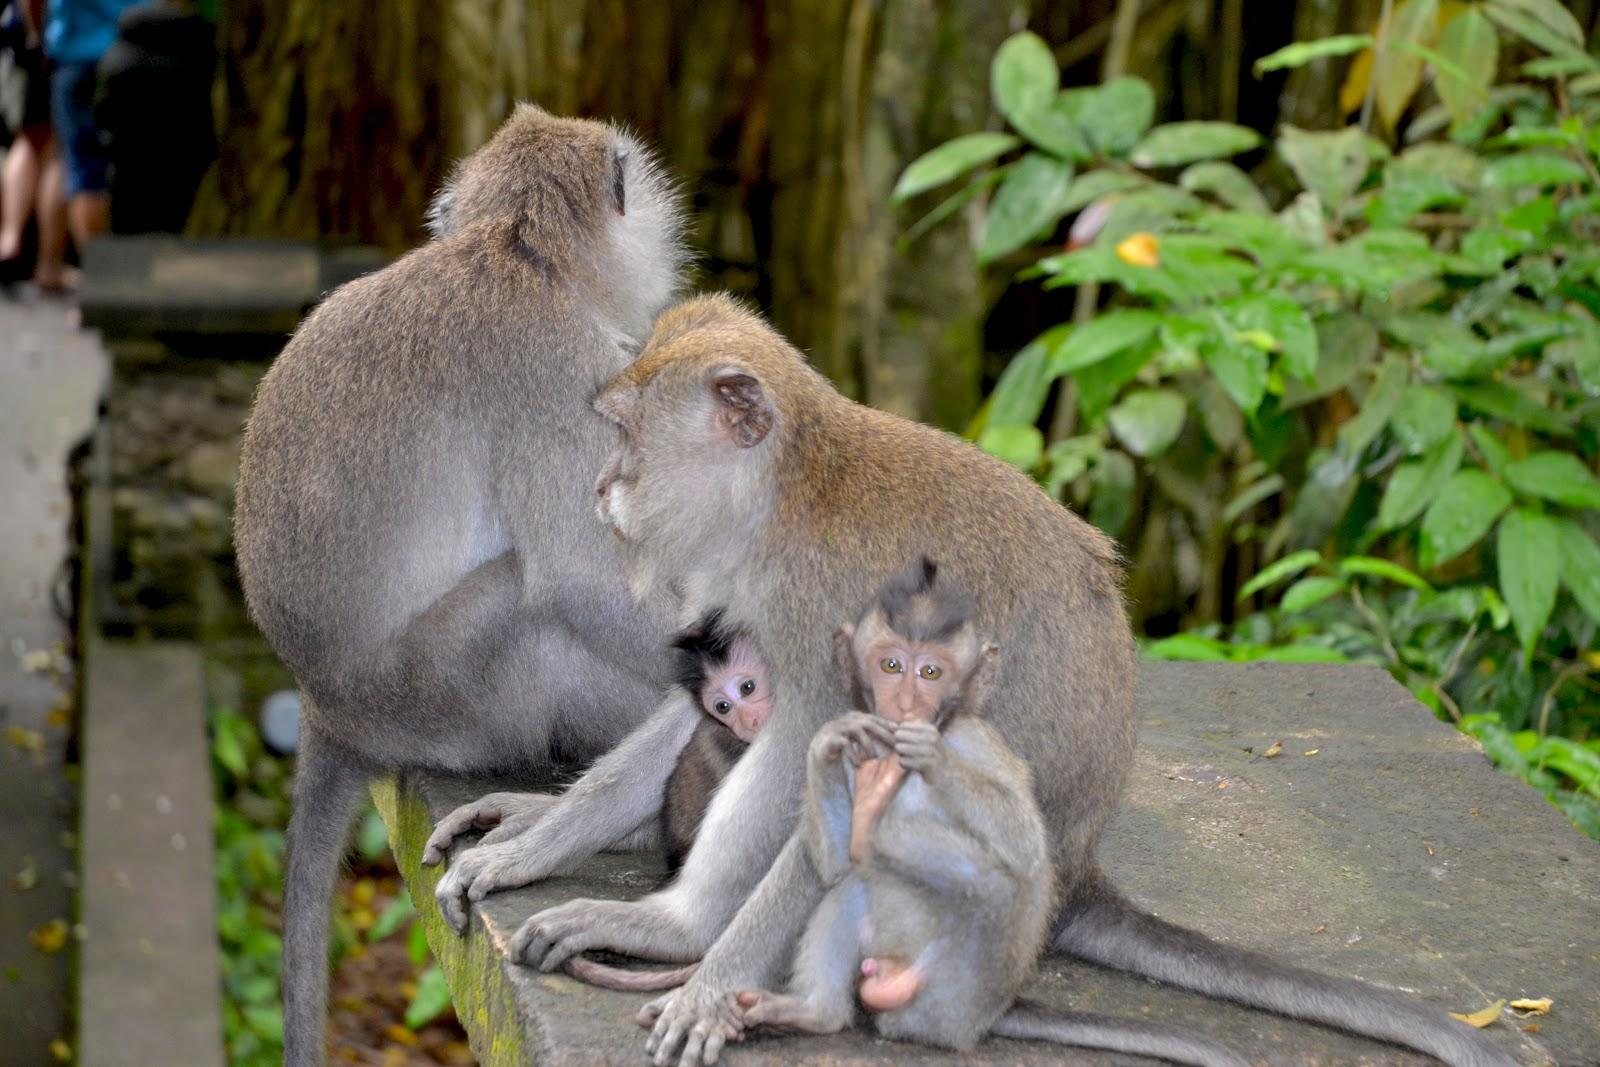 Tempat Wisata Sangeh Bali Banyak Dihuni Monyet (travelingyuk.com)